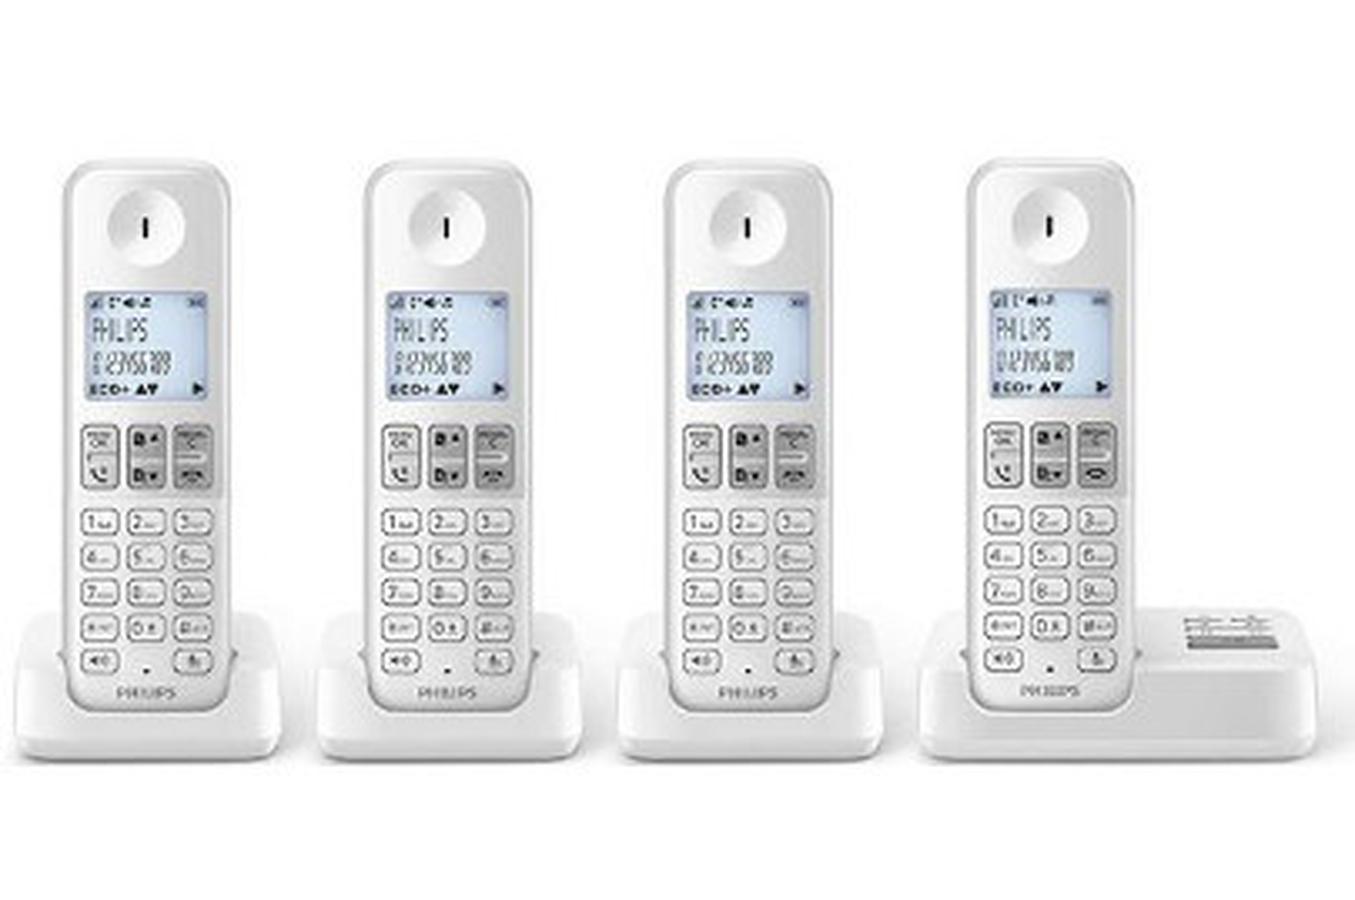 nav achat gps communication telephonie fixe telephone sans fil philips dw fr